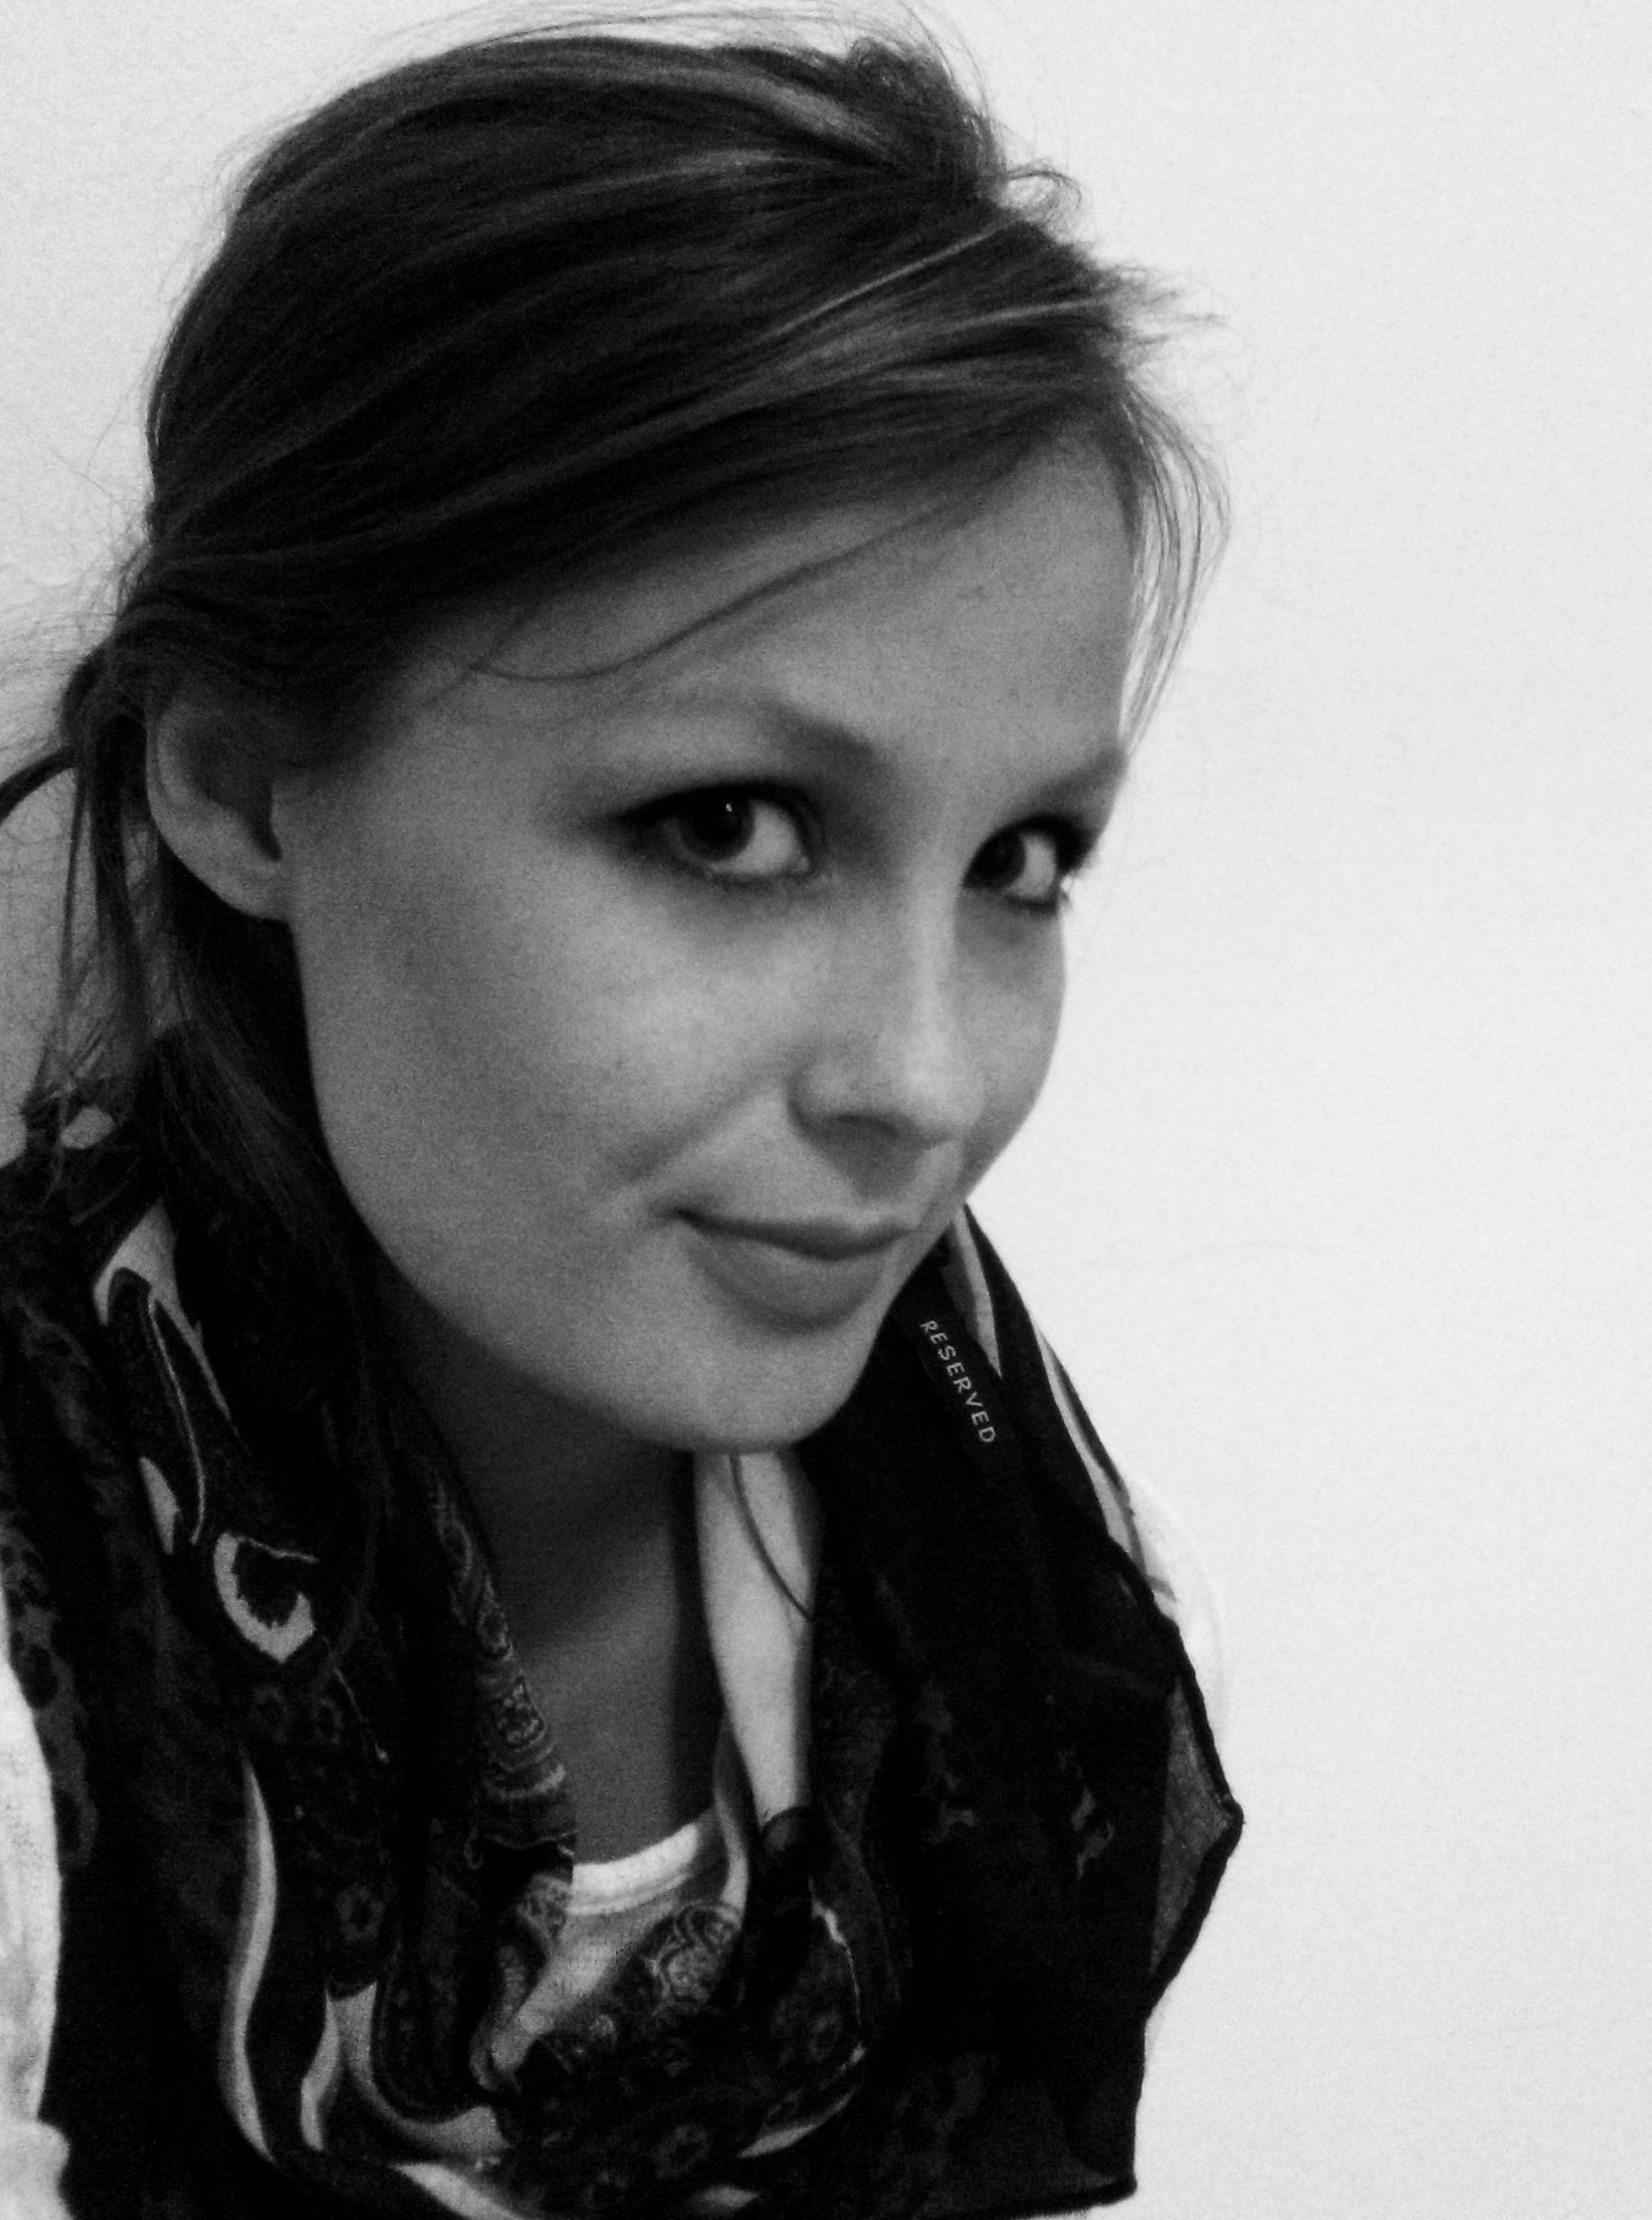 Aleksandra Spychalska